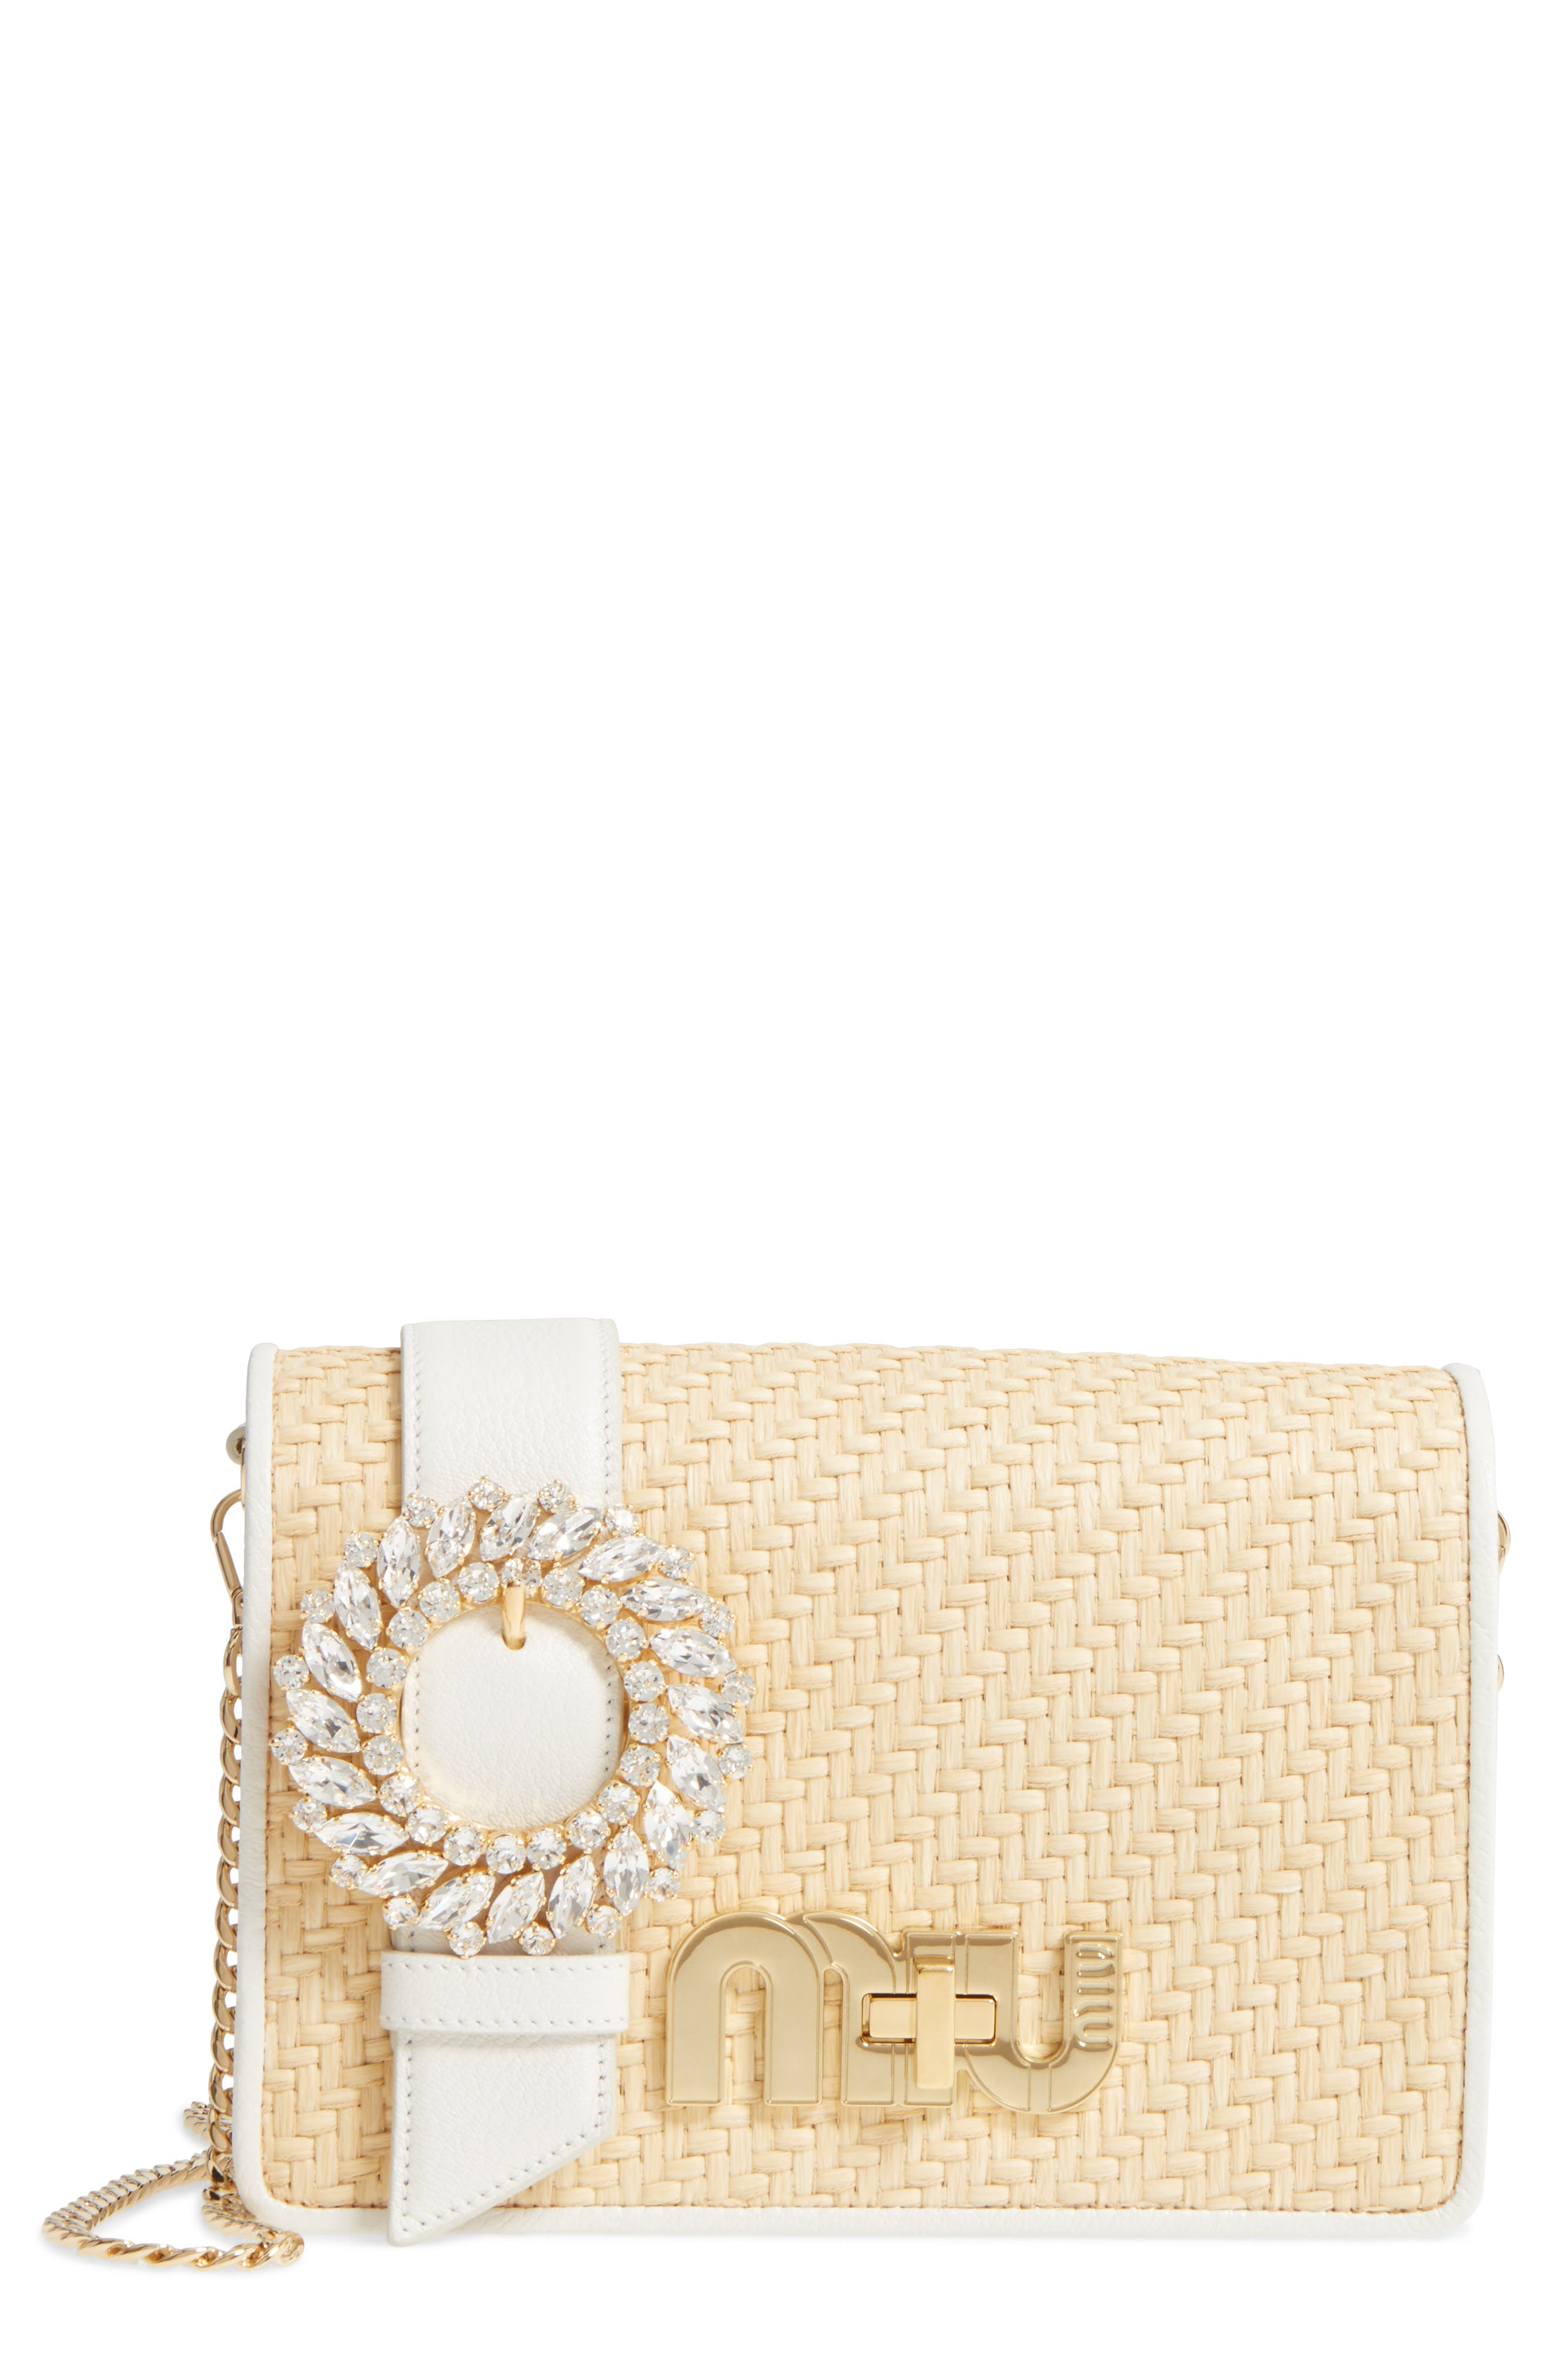 Woven Raffia & Leather Shoulder Bag,                         Main,                         color, Naturale/ Bianco